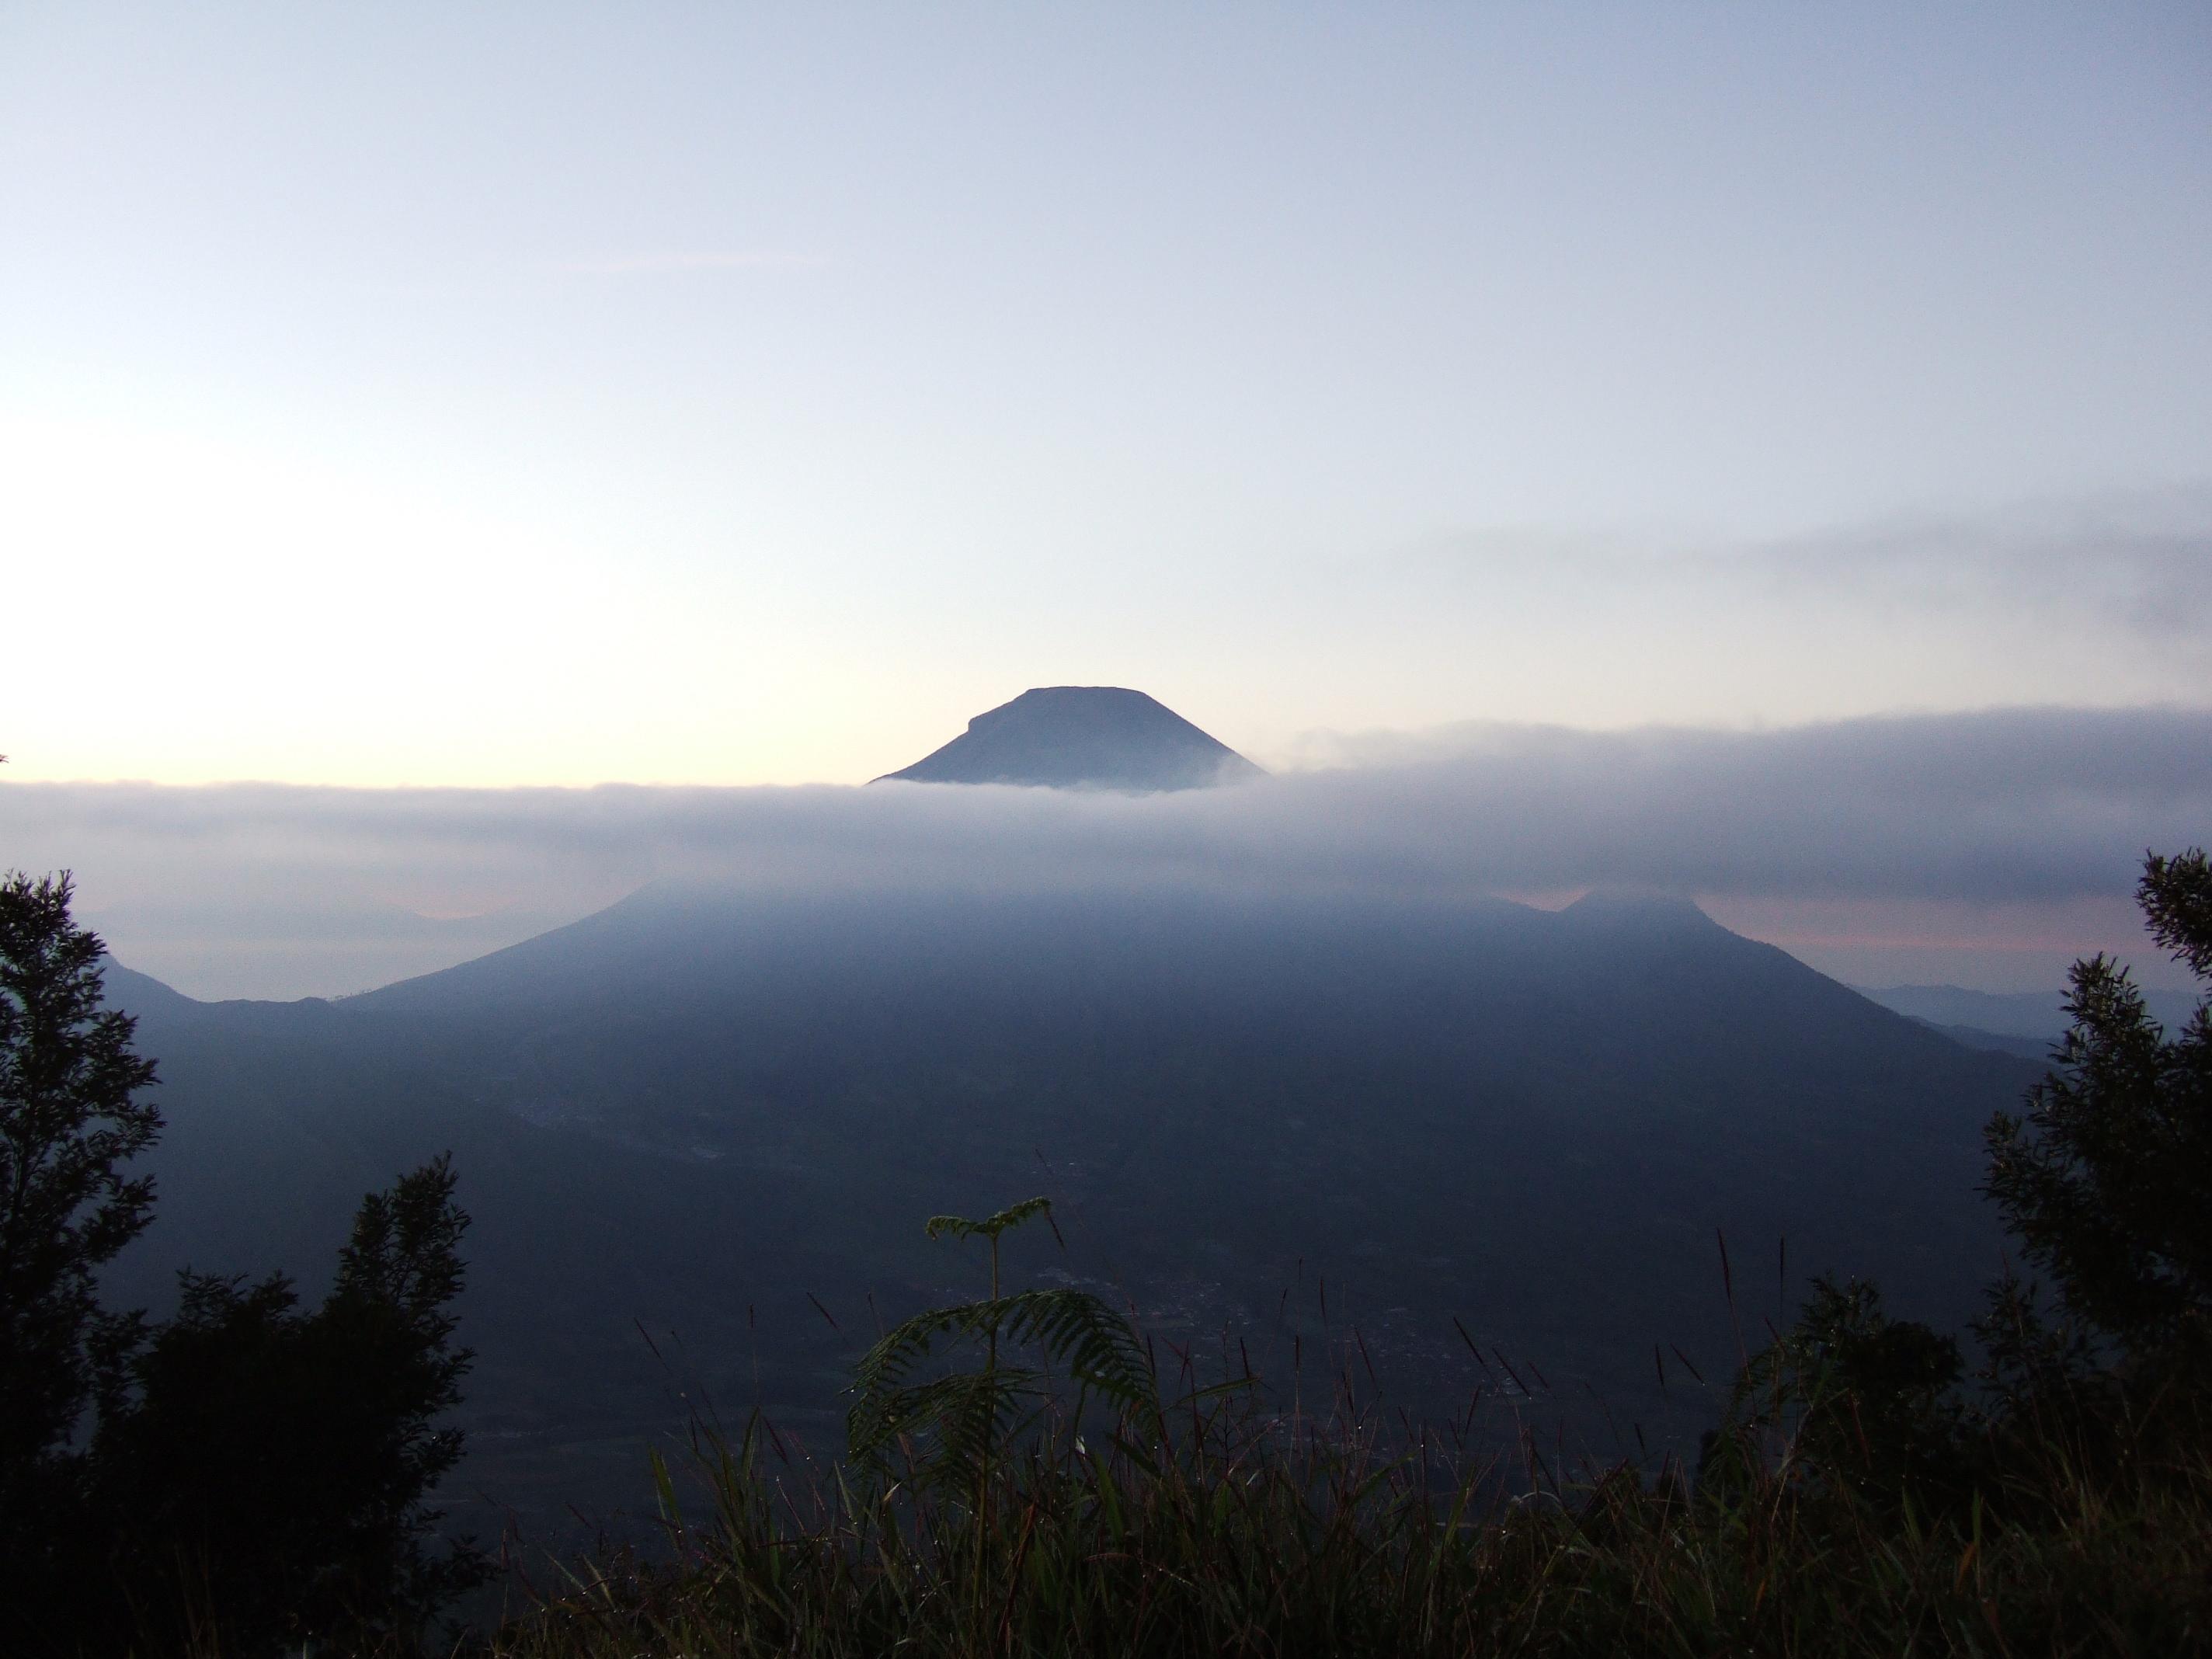 Gunung Sindara Wikipedia Bahasa Indonesia Ensiklopedia Bebas